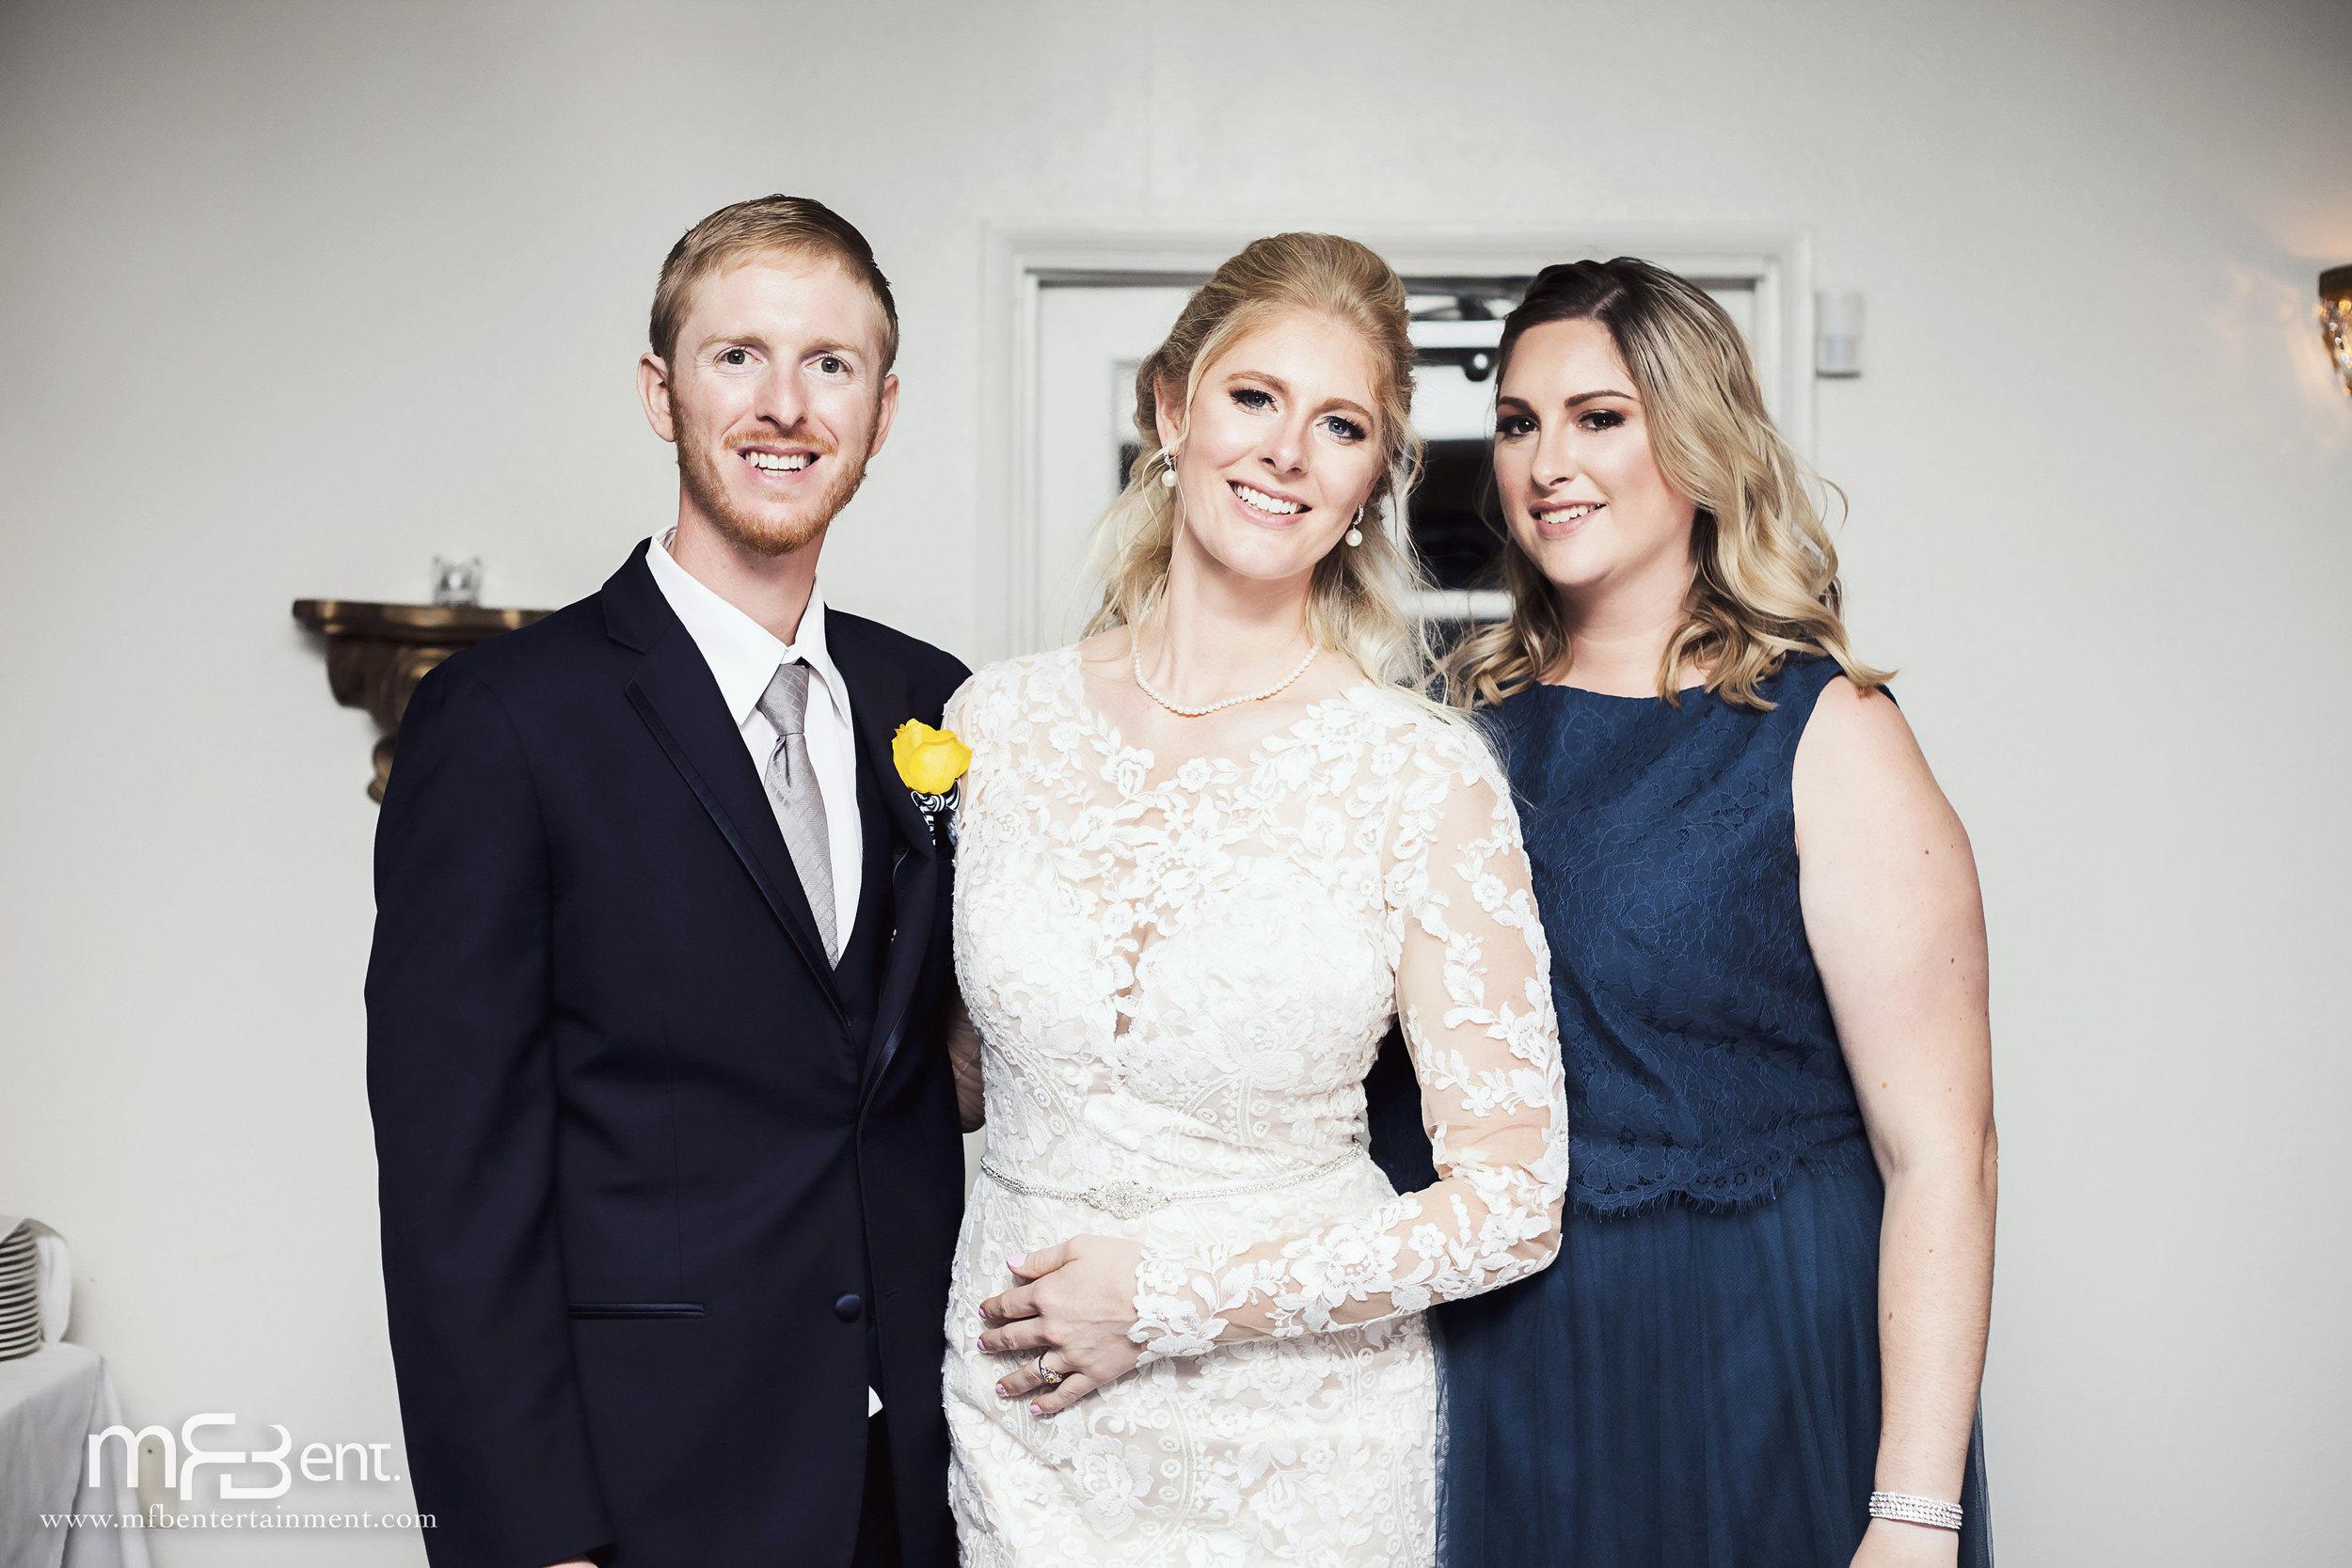 PIOTR CHELSEA WEDDING-RECEPTION-0185 L.jpg